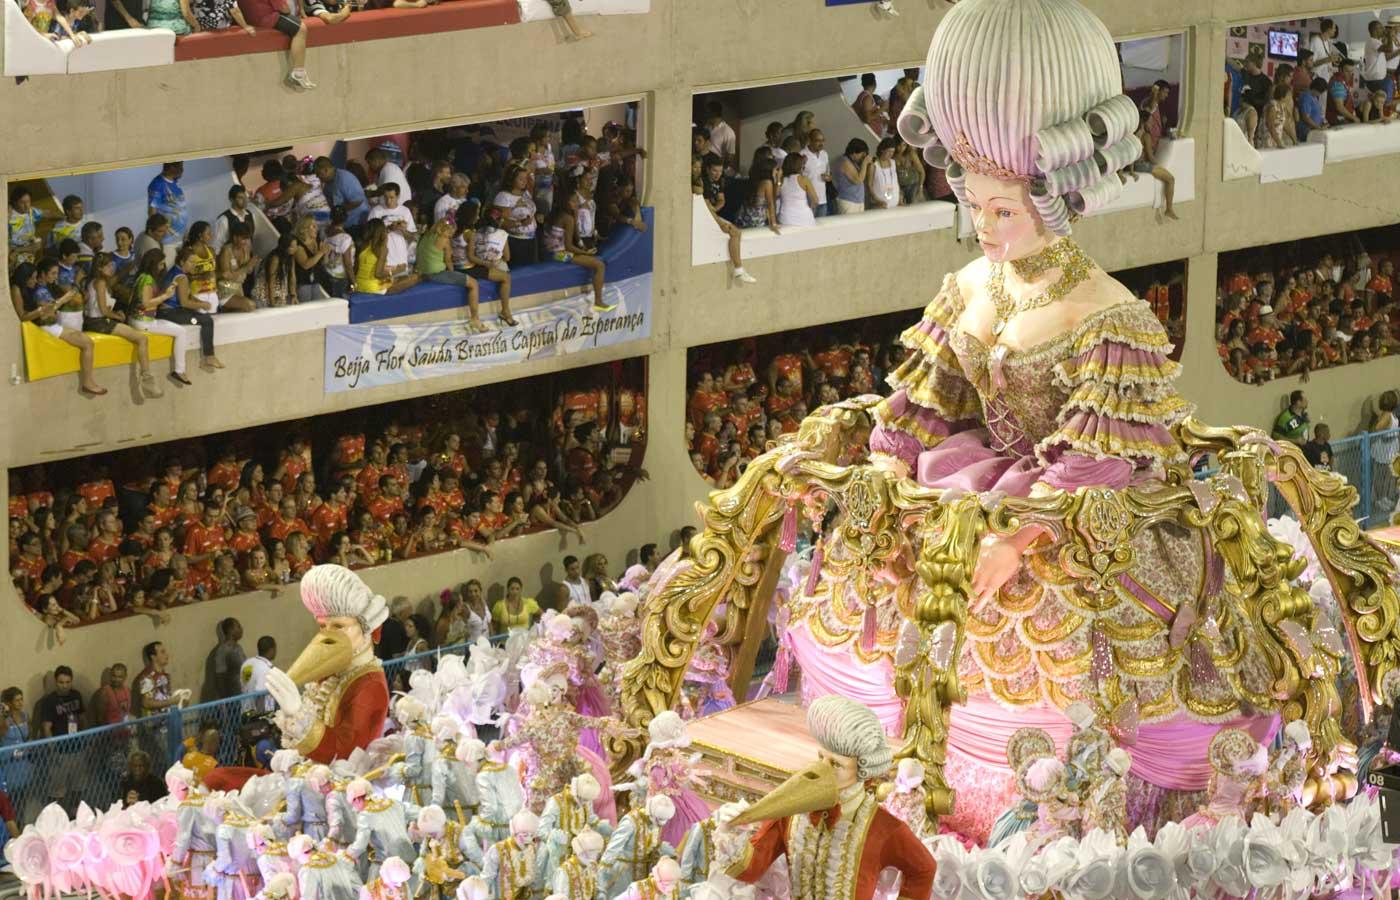 Rio Carnival Sambadrome parade